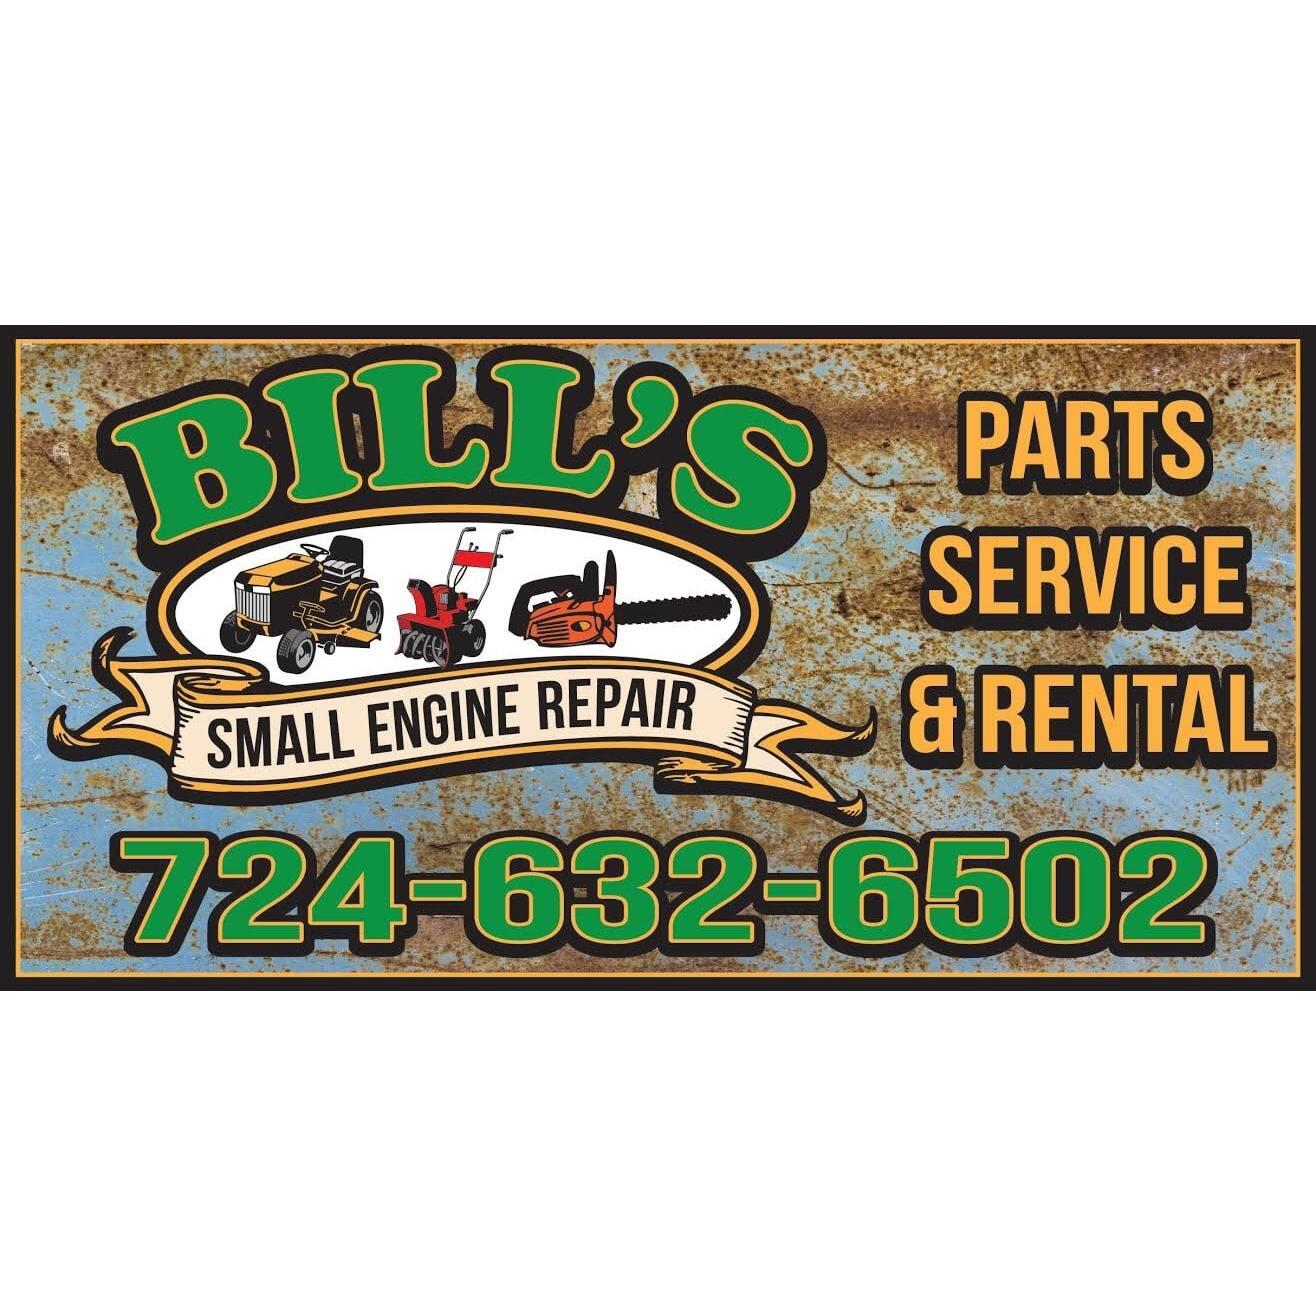 Bill's Small Engine Repair